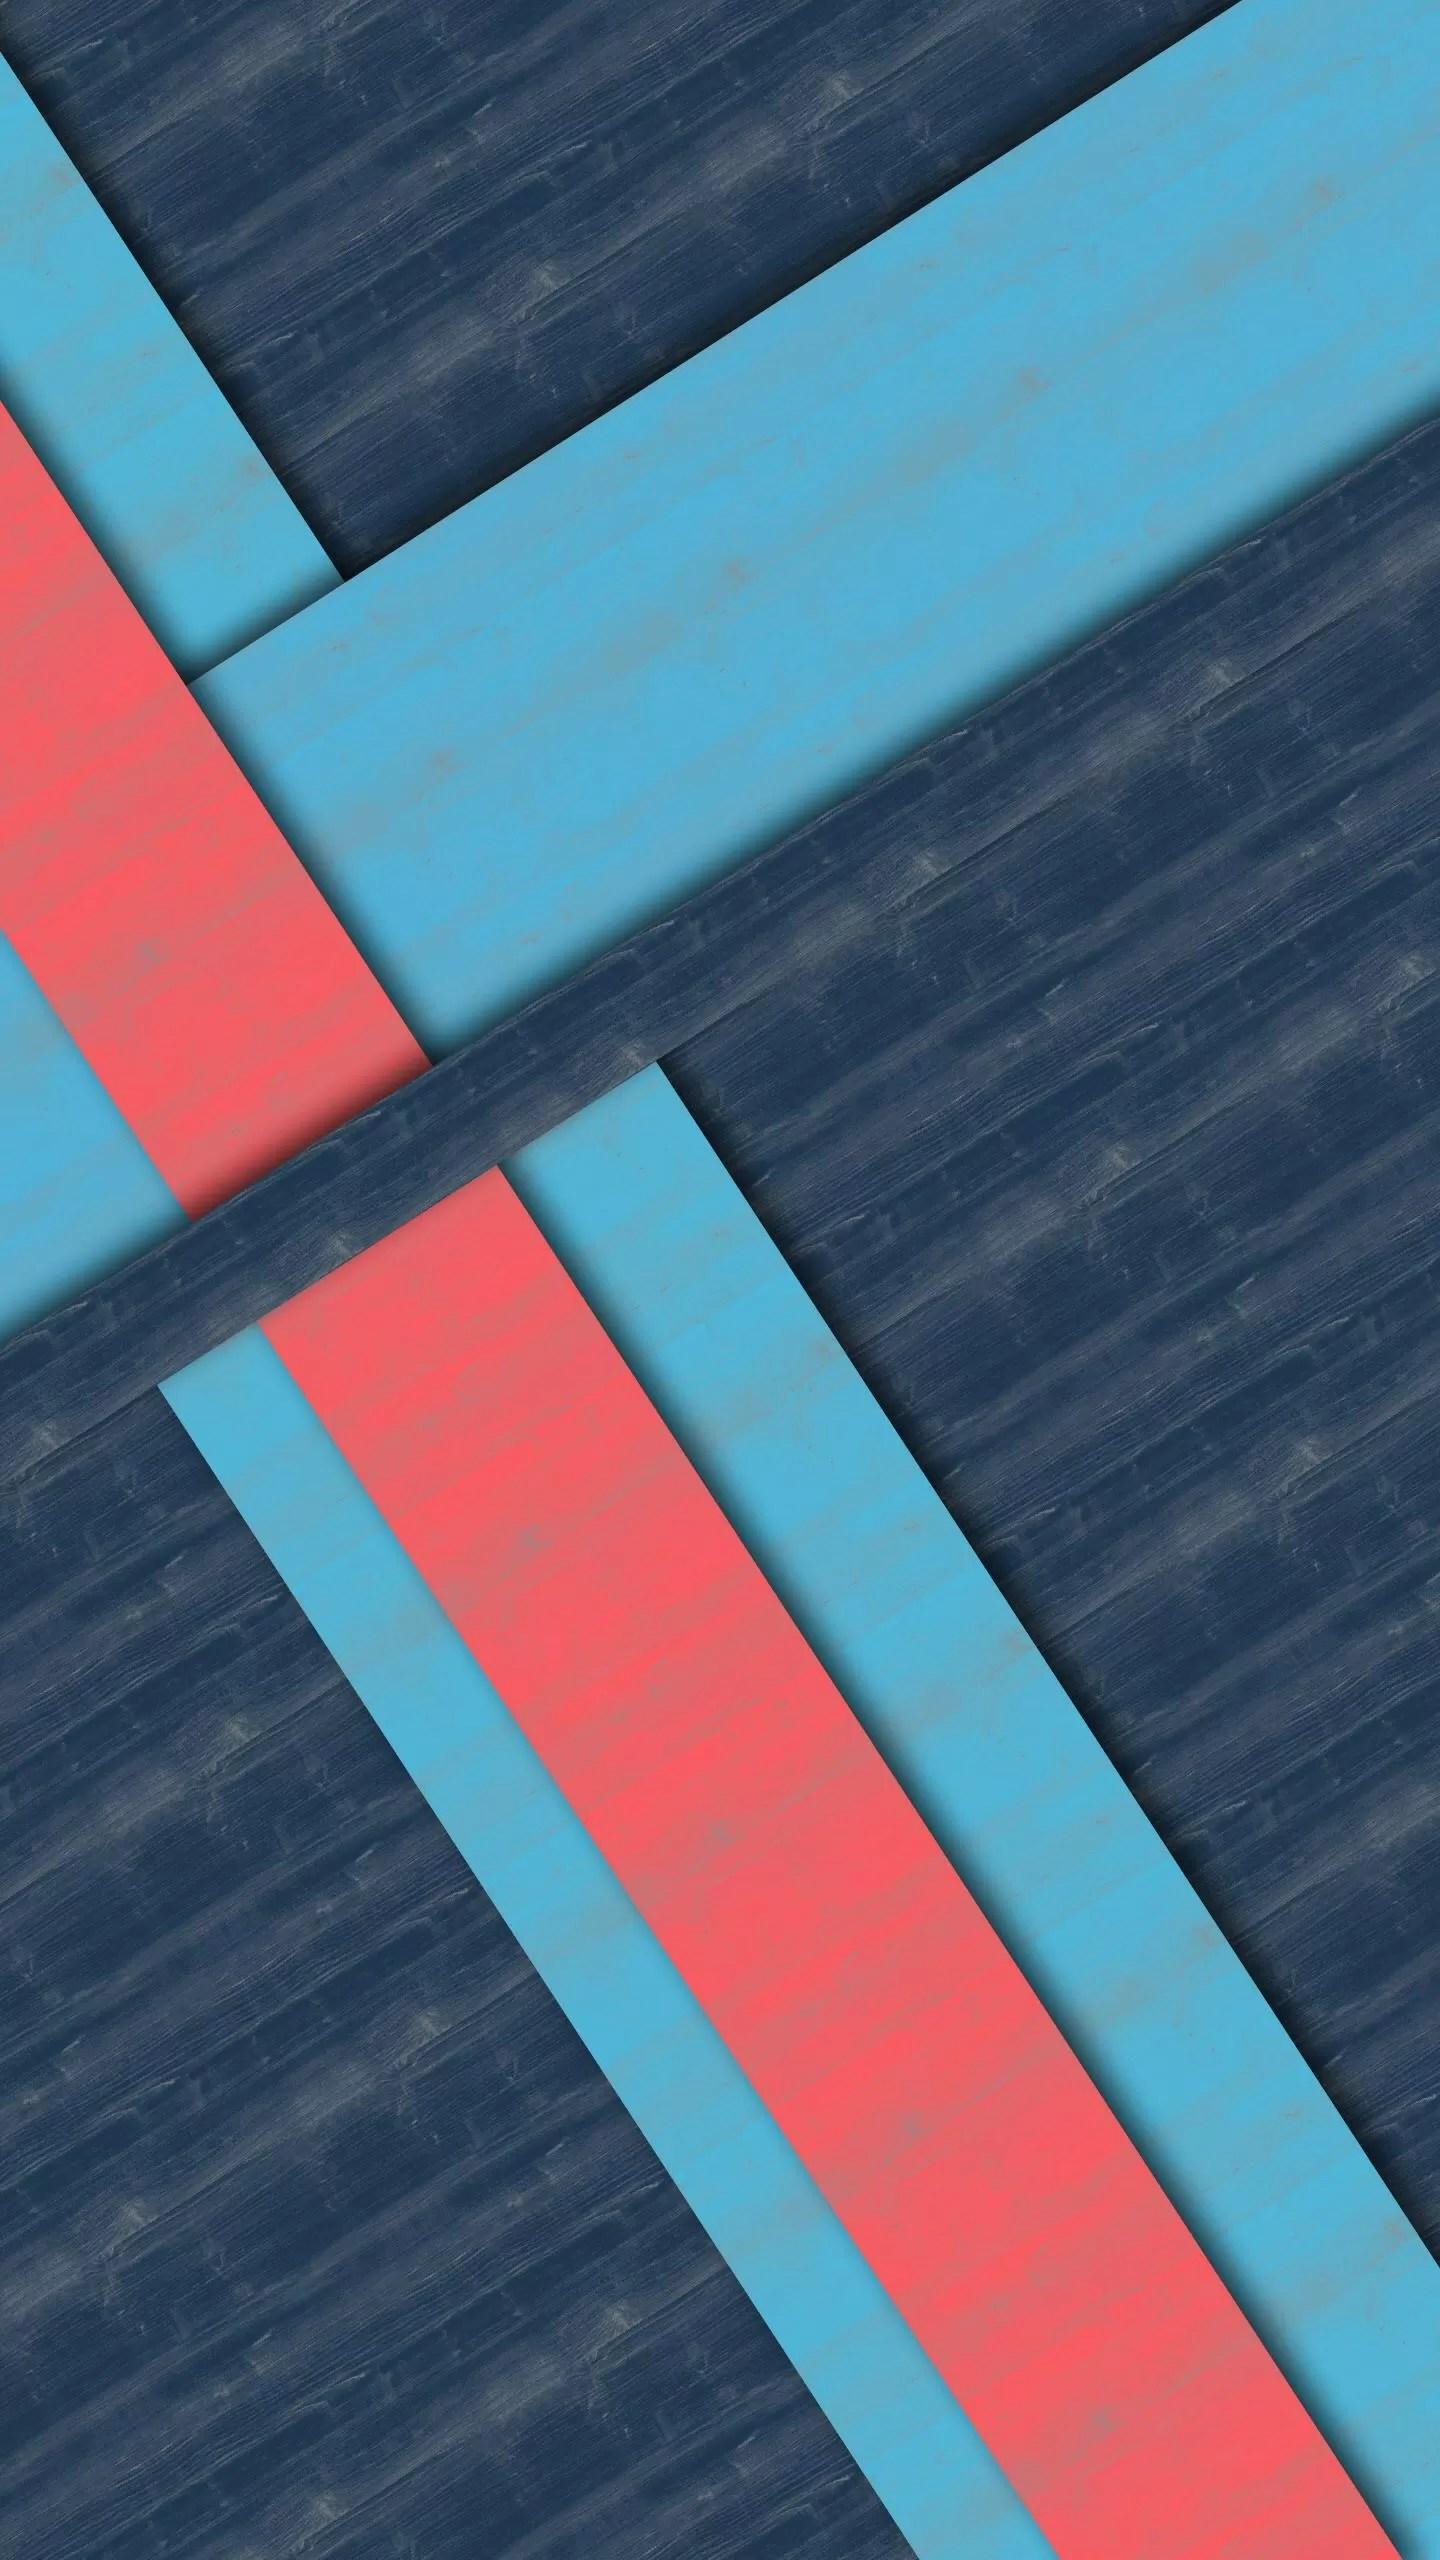 Desktop Nexus 3d Wallpapers 5 Days Of Awesome Wallpapers Geometric Wallpapers Techspot